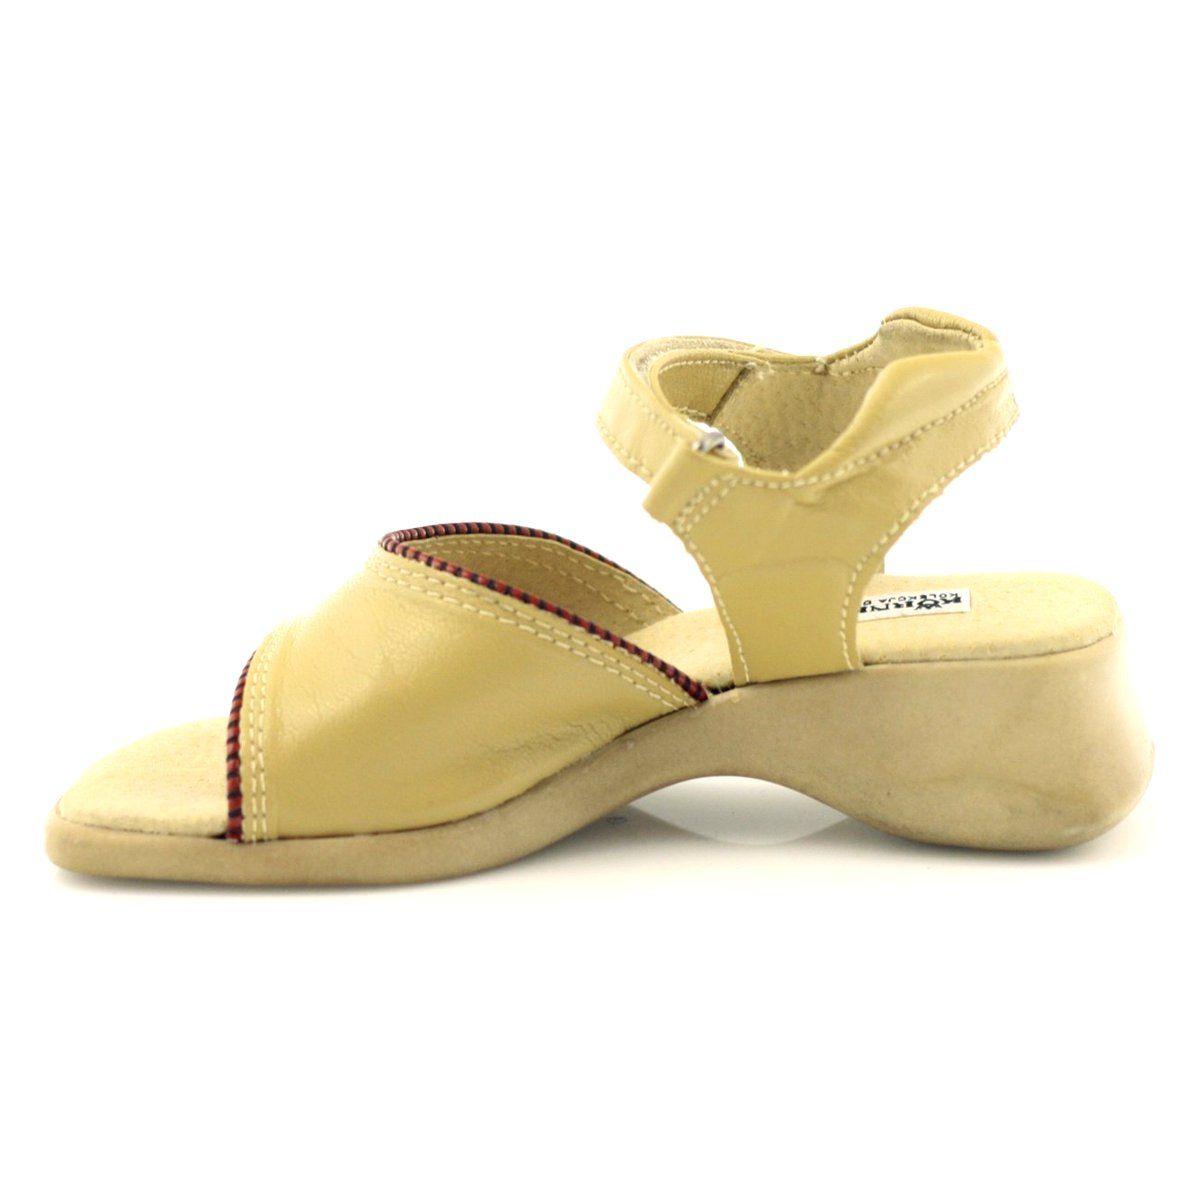 Sandalki Dziewczece Kornecki 090 Bezowe Czerwone Brazowe Slip On Sandal Shoes Mule Shoe